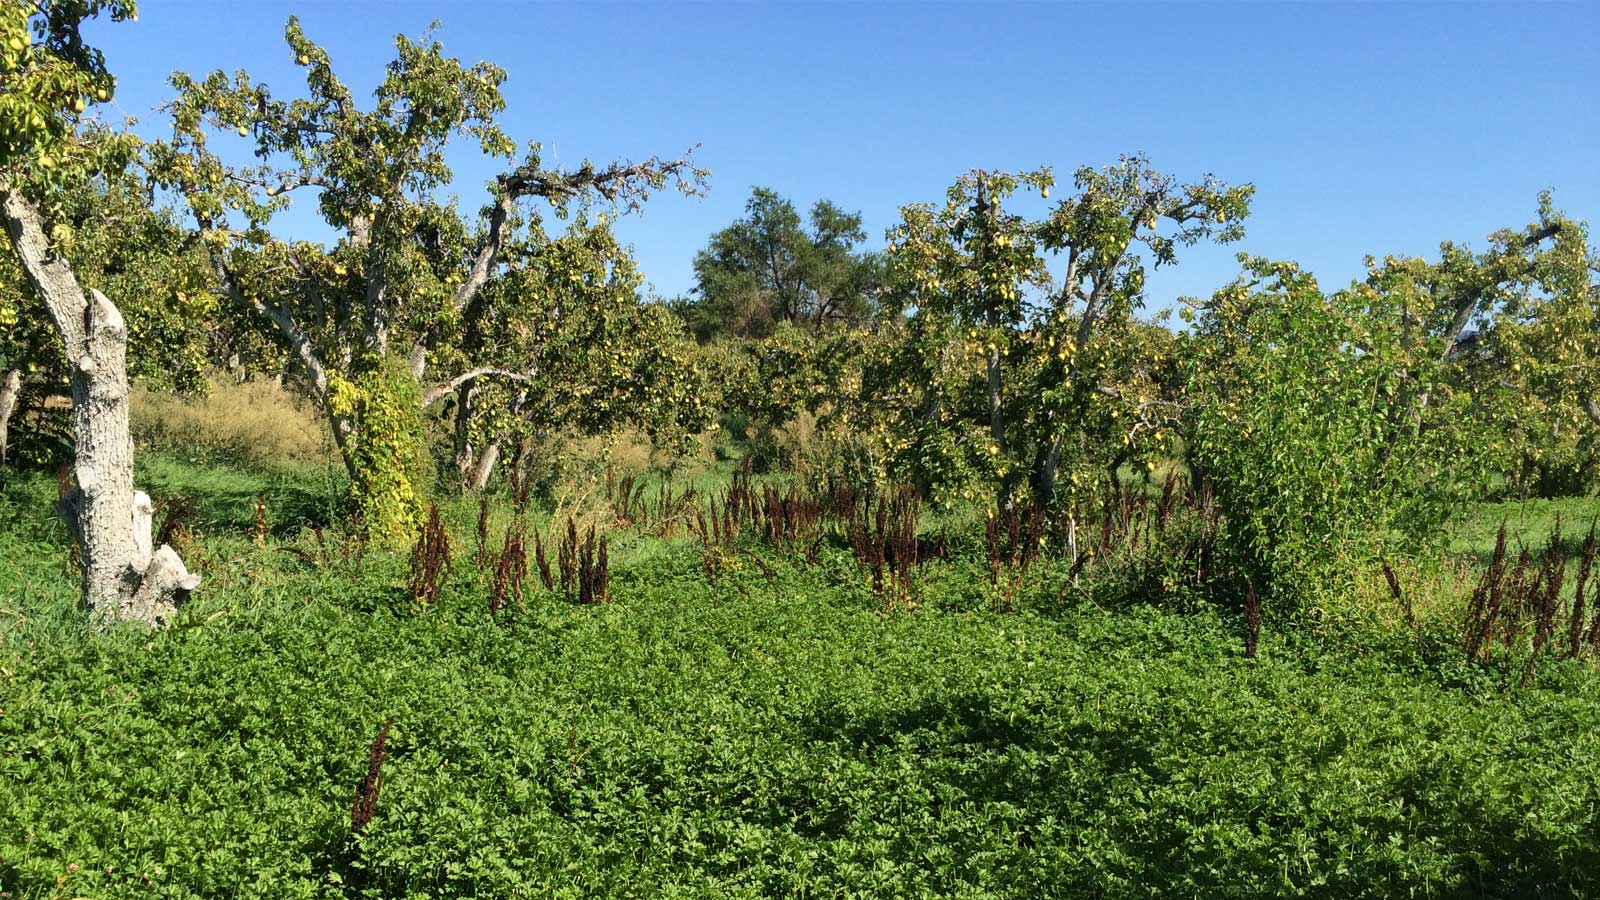 Backyard Fruit Tree Removal Program